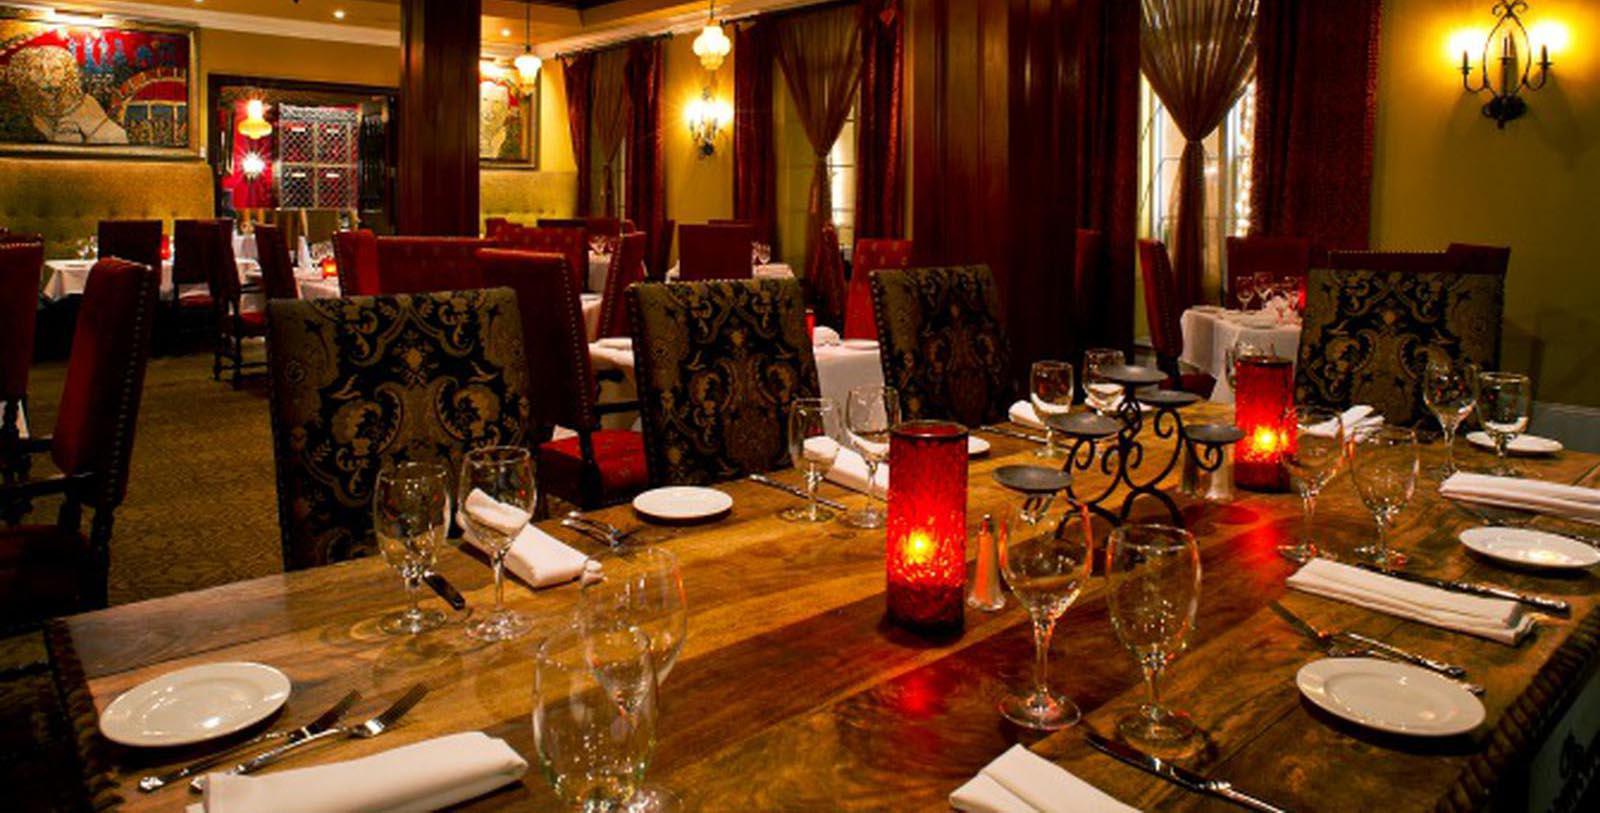 Image of Cobalt Lounge restaurant at Casa Monica Resort & Spa, 1888, Member of Historic Hotels of America, in St. Augustine, Florida, Taste